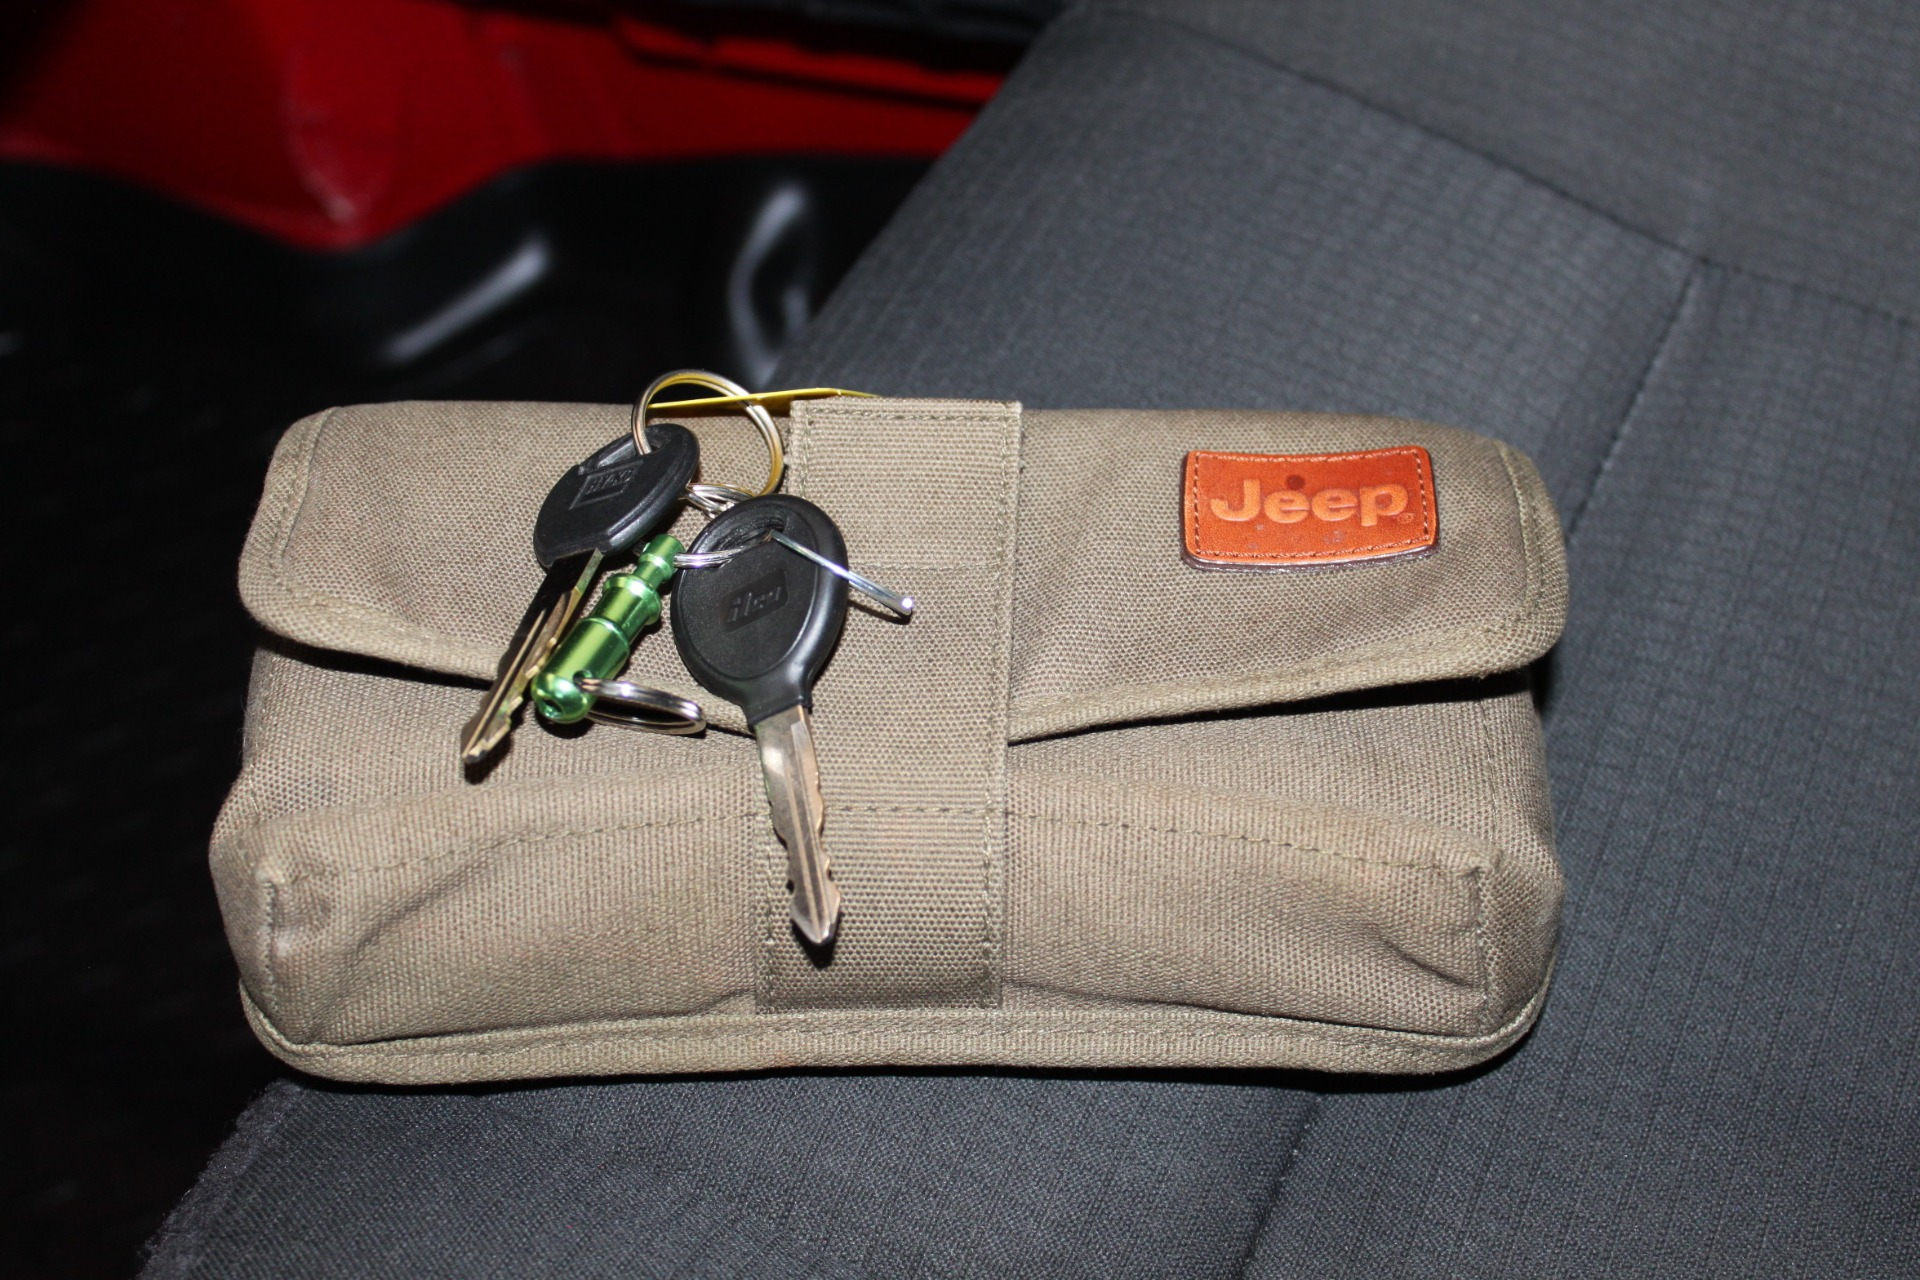 Used-2006-Jeep-Wrangler-4X4-LJ-Unlimited-LWB-Grand-Cherokee